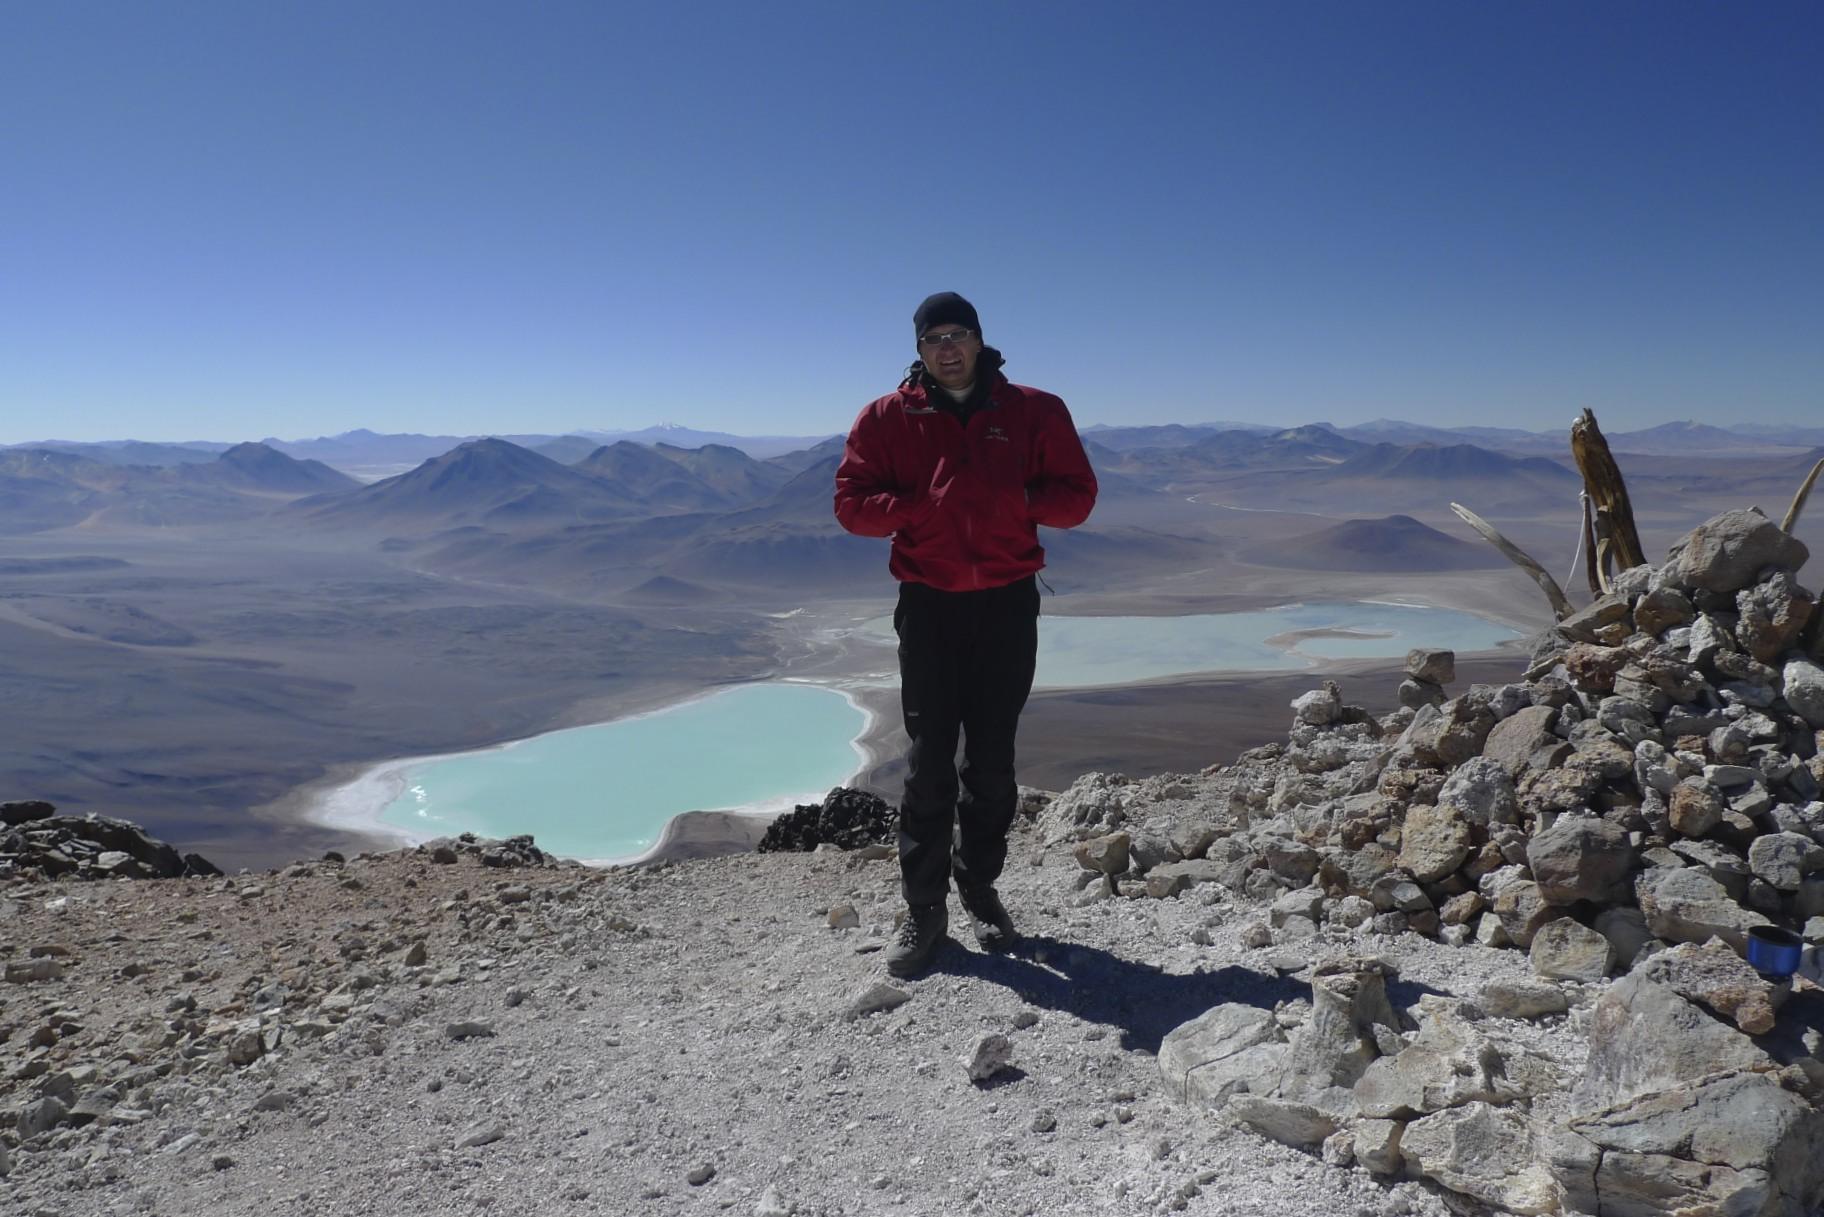 The summit of the Licancabur 5,920m